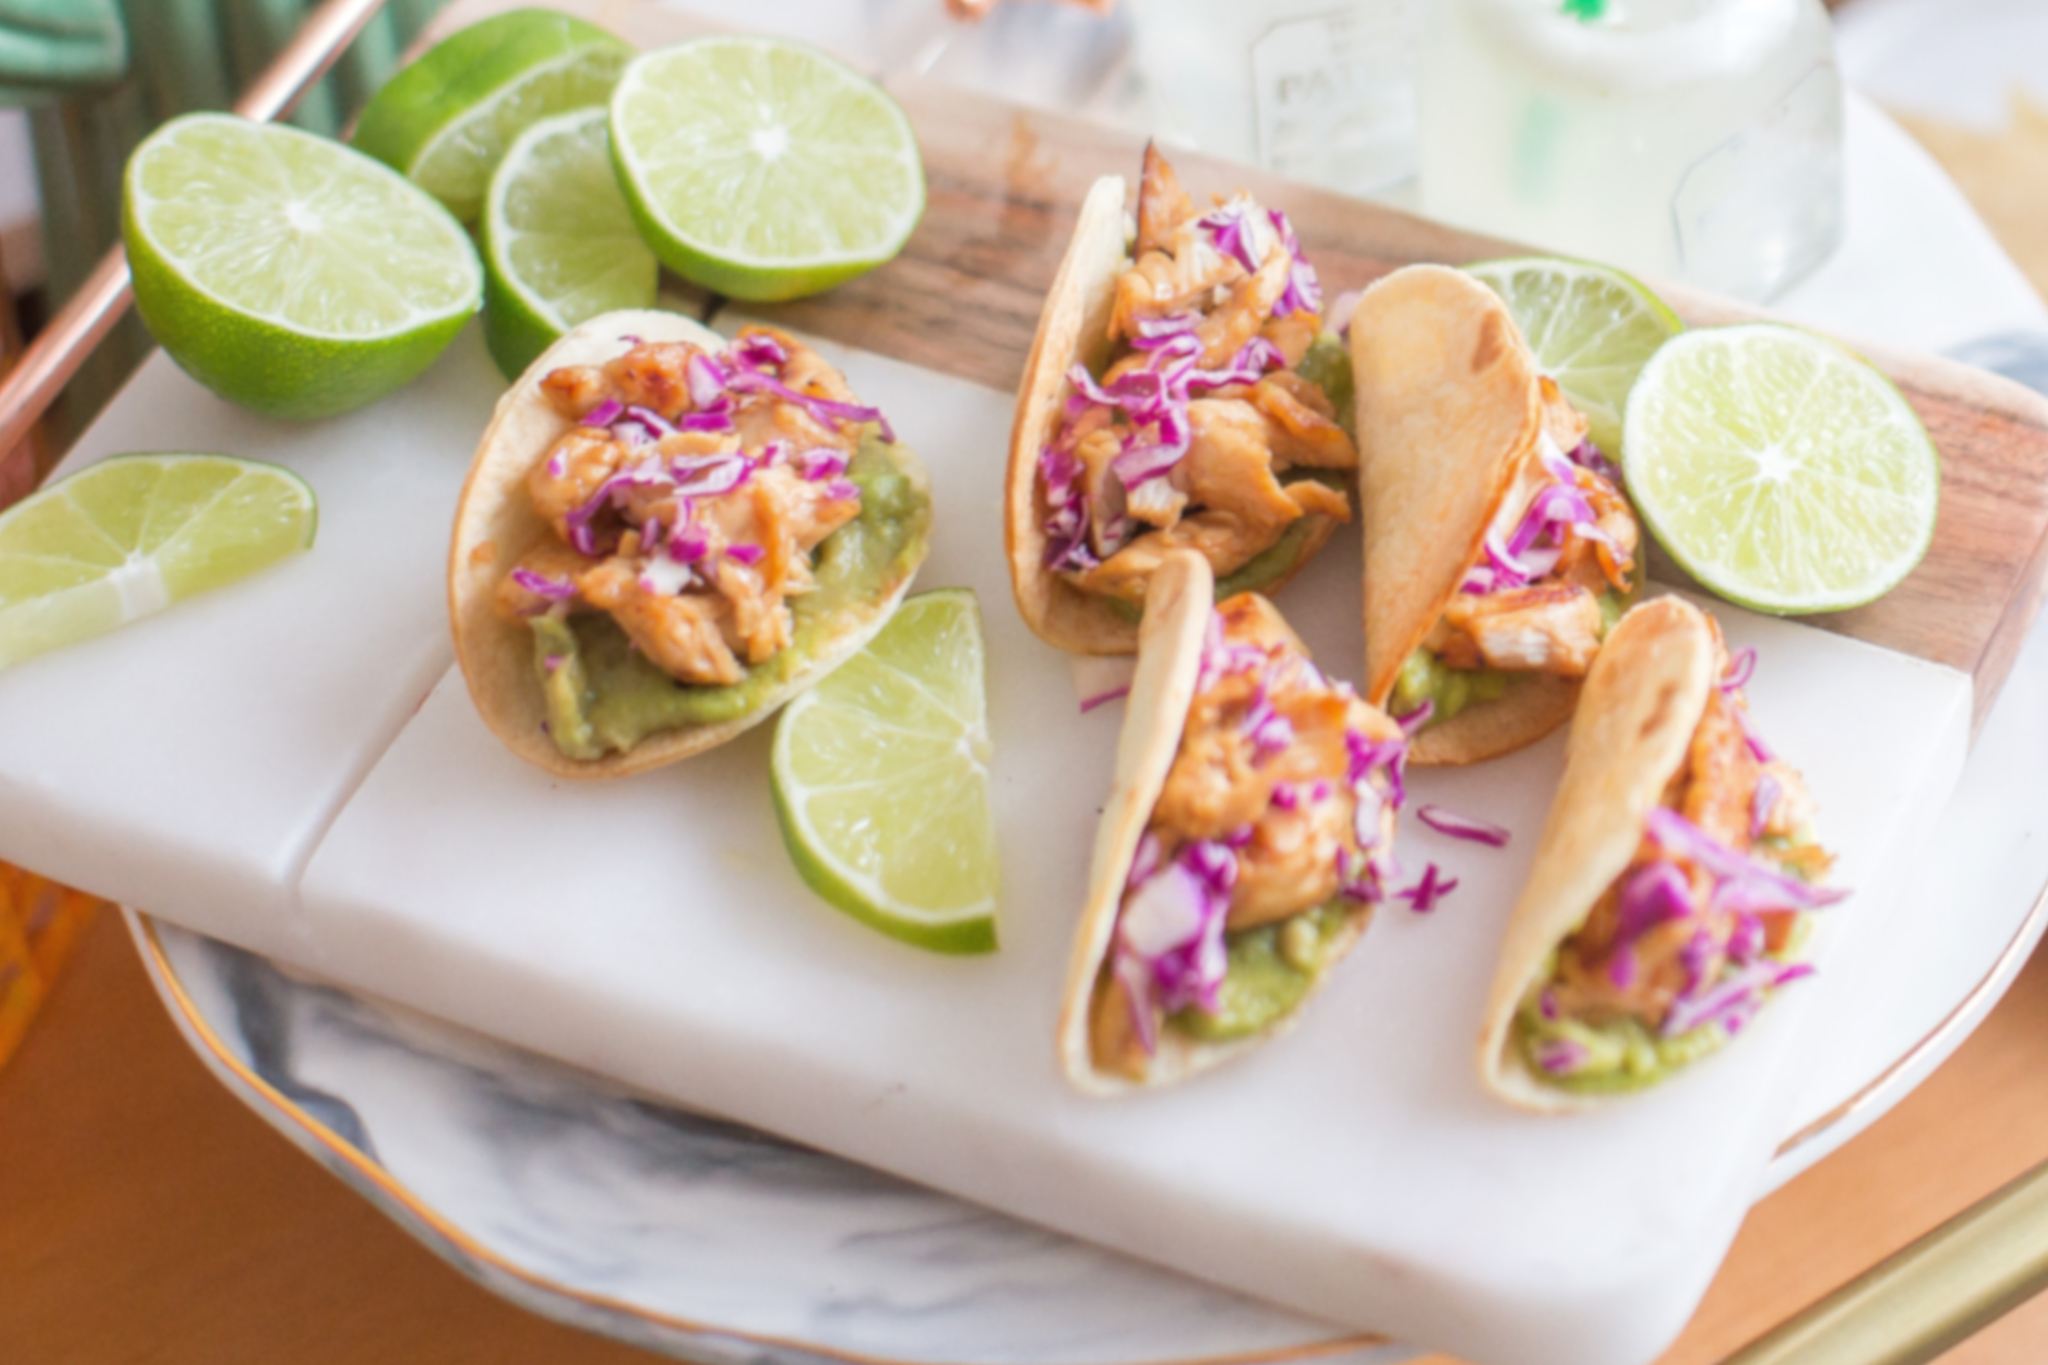 SEAFOOD - Mini Ahi TacosTuscan Grilled Shrimp on PolentaTuna Poke in Chinese SpoonsSalmon Ceviche ShootersScallop + Chorizo SkewersWasabi Tuna in Wonton Cones